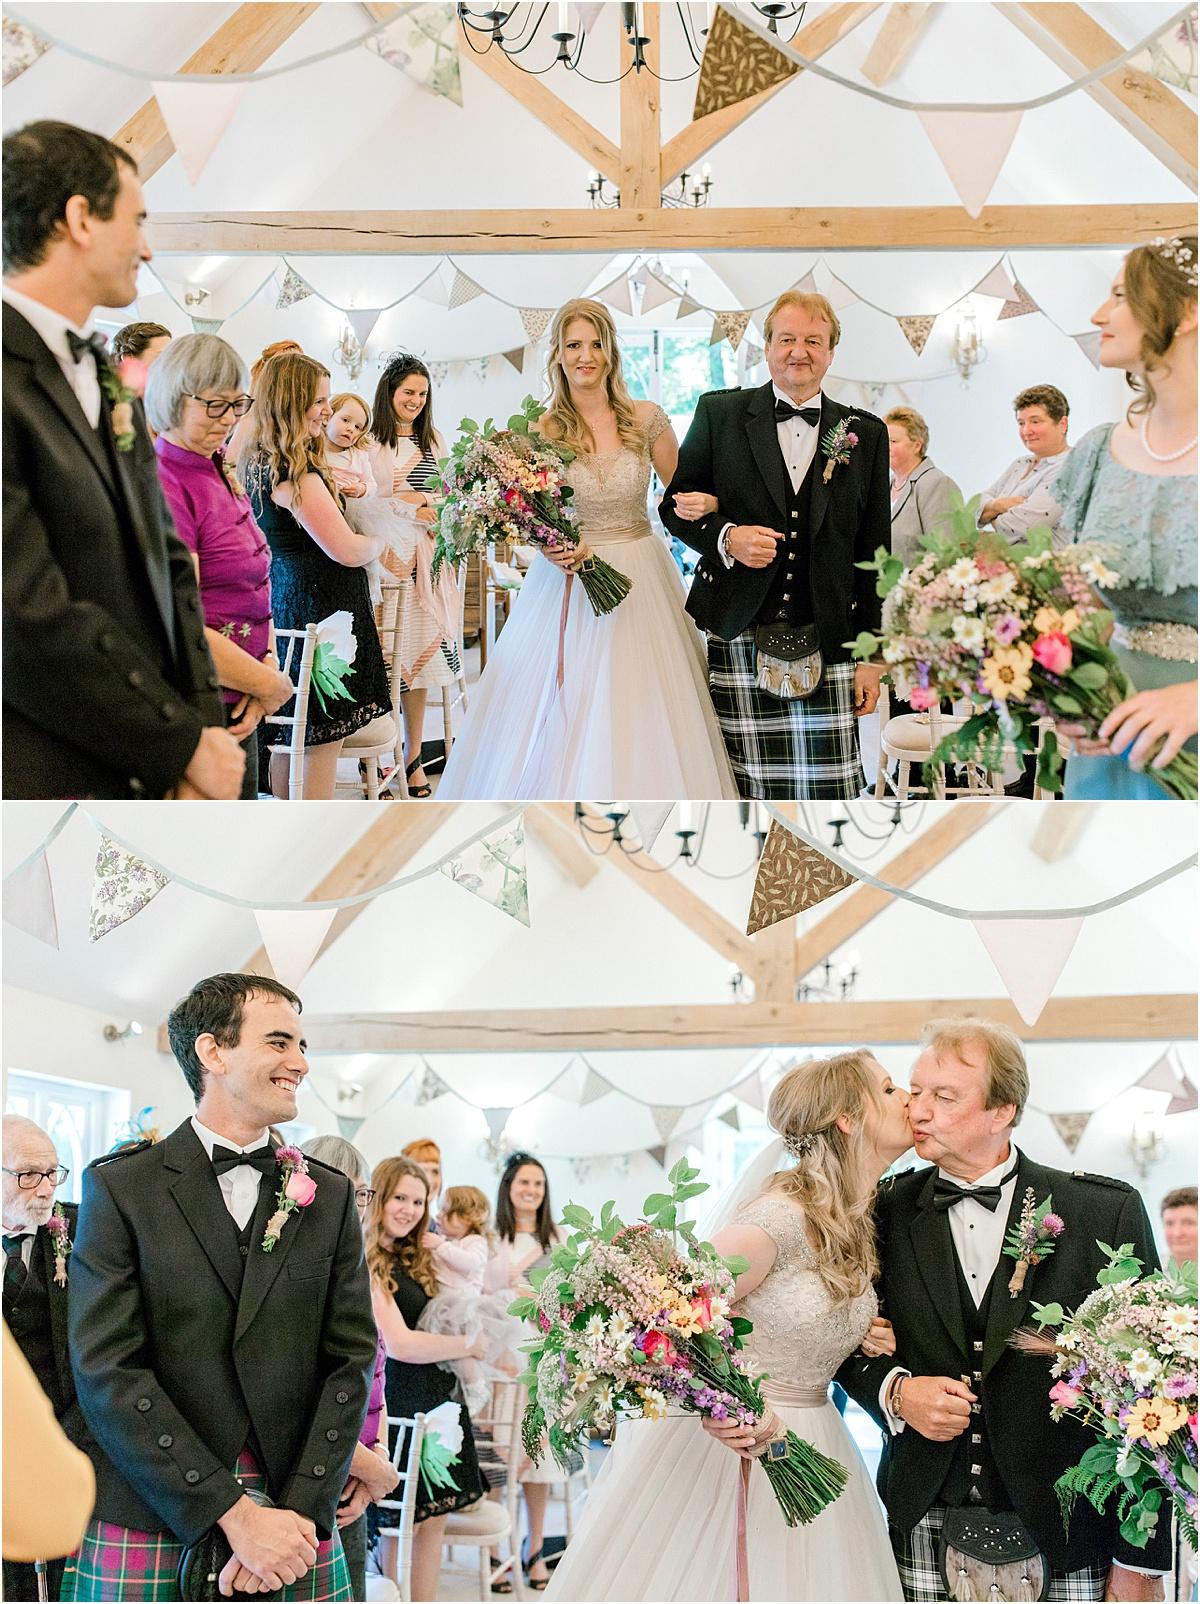 Fine Art Wedding Photographers,Glentruim Estate Wedding,Newtonmore,Scottish Wedding in the highlands,The Gibsons,elegant wedding photographers glasgow,natural wedding photographers,romantic photographers Scotland,romantic wedding photographers,romantic wedding photographers scotland,